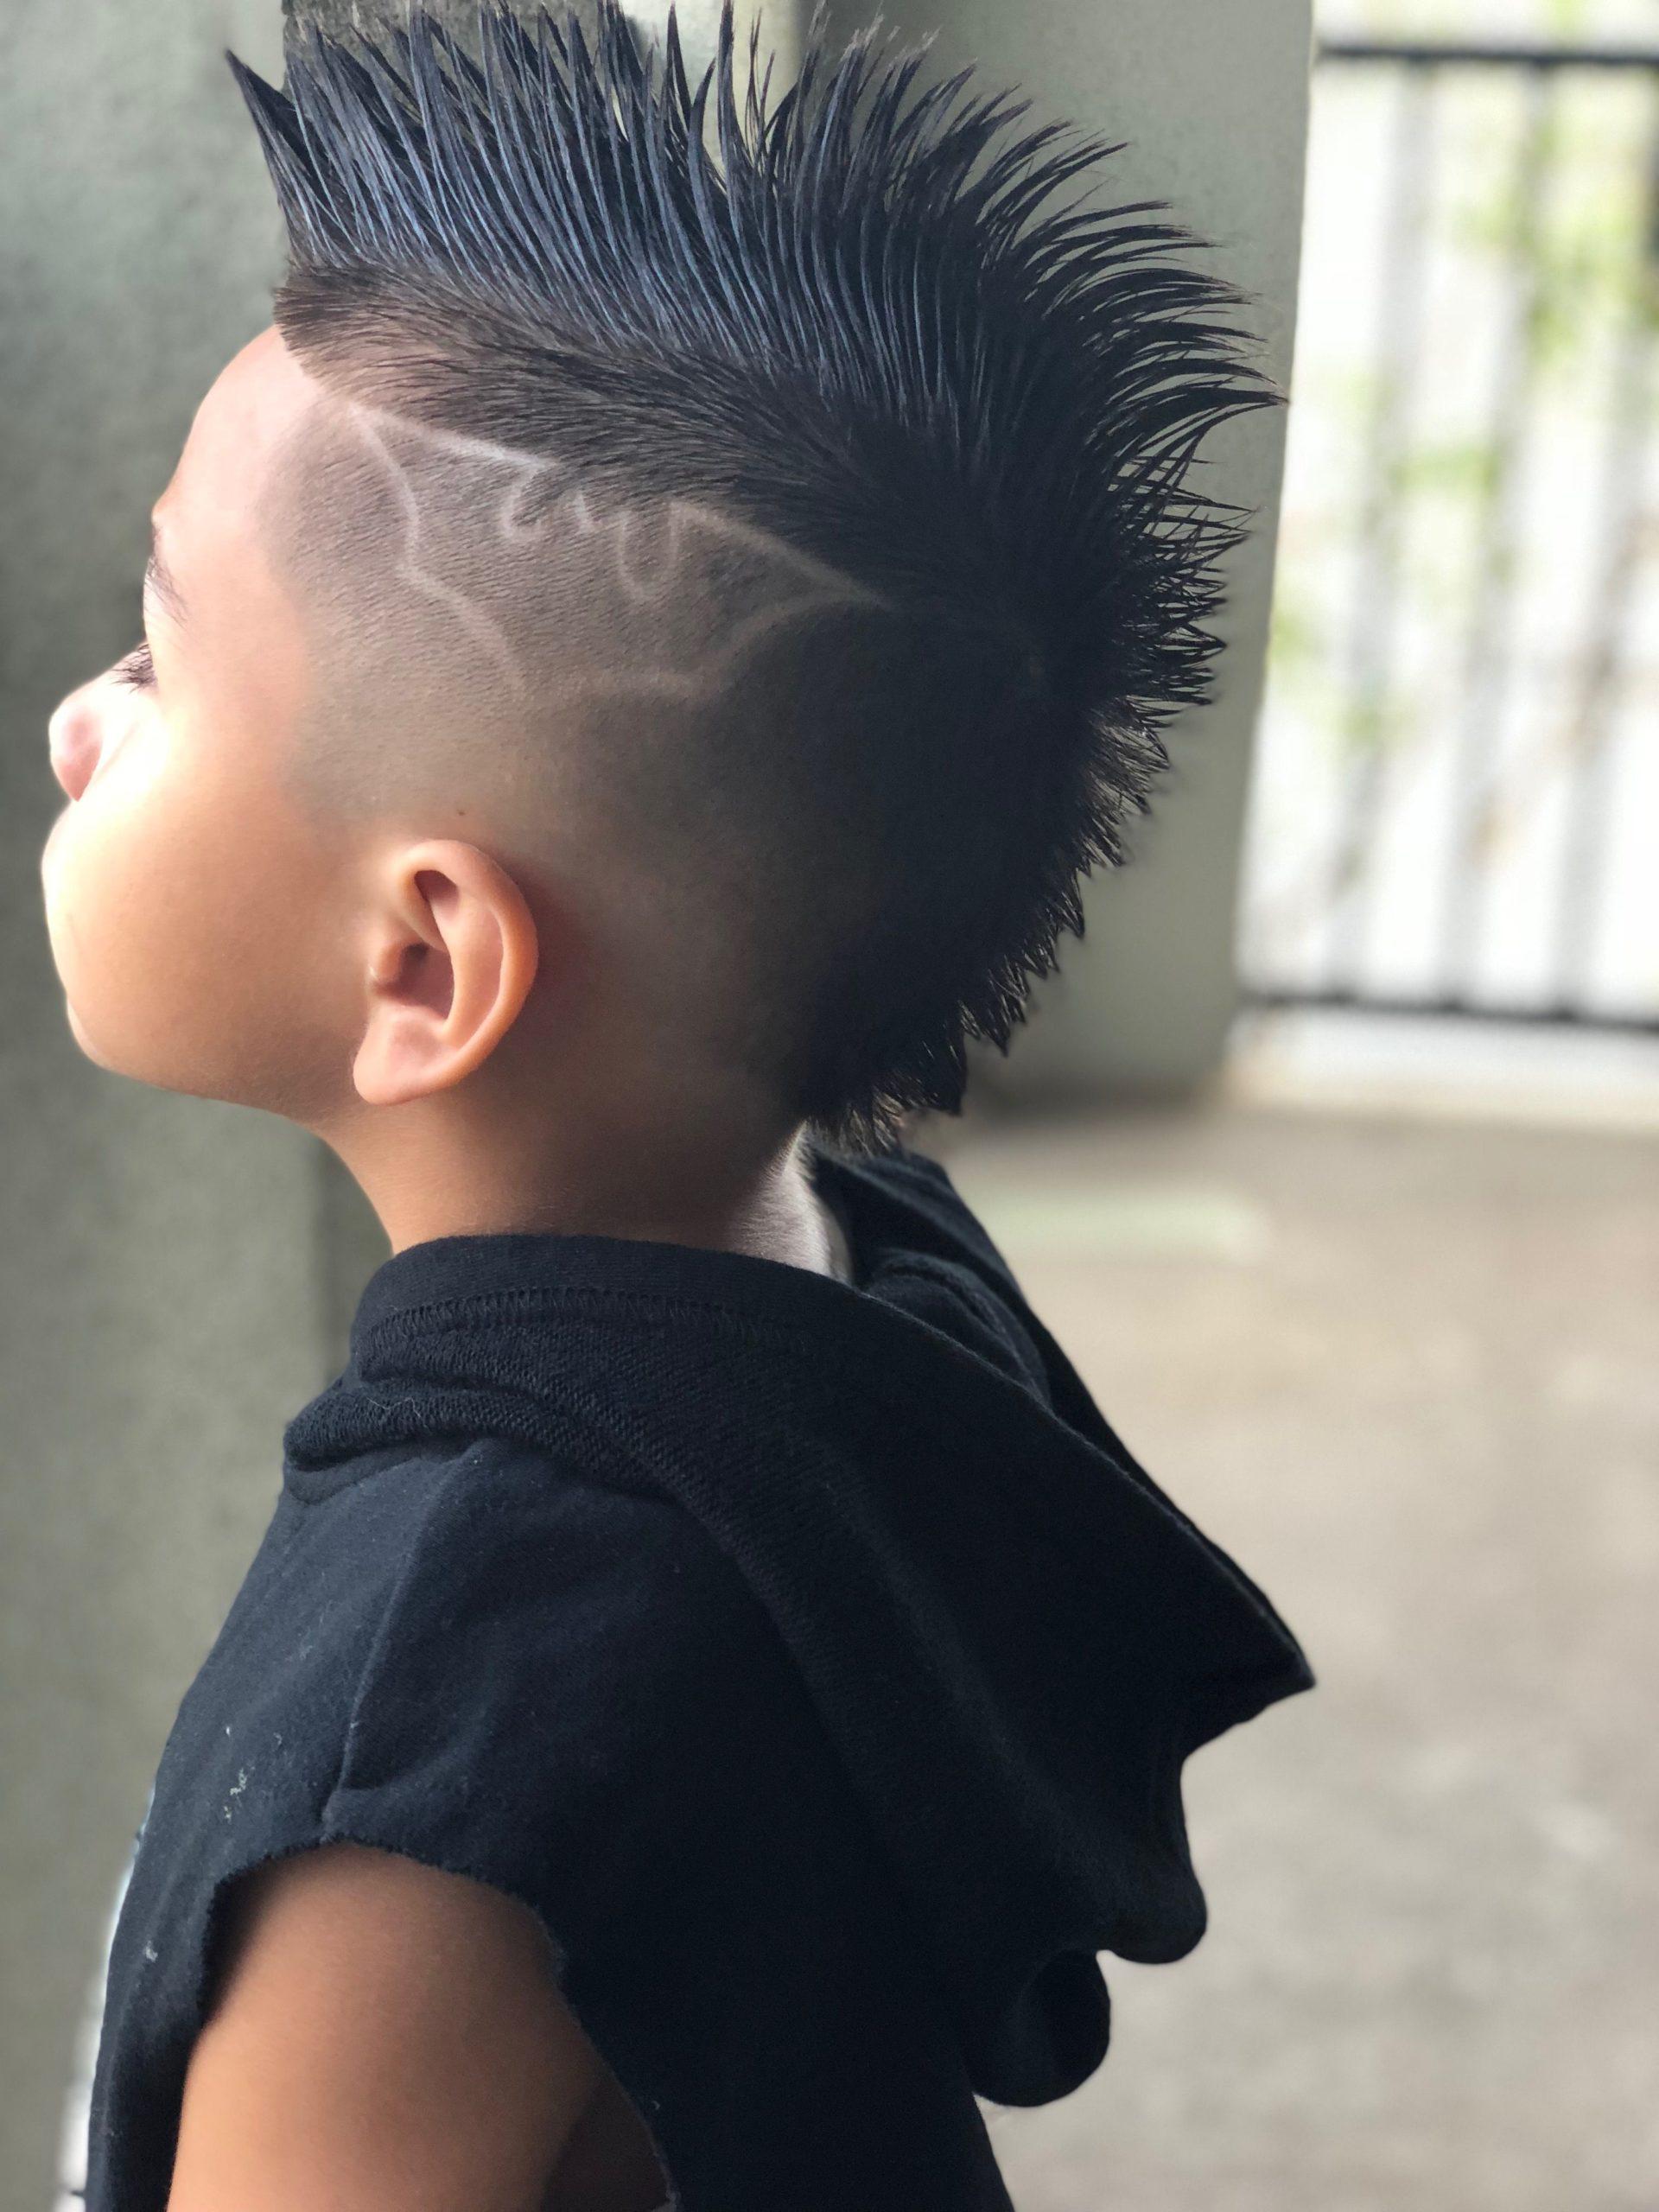 Best Boys Haircut 2021 - Mr Kids Haircuts